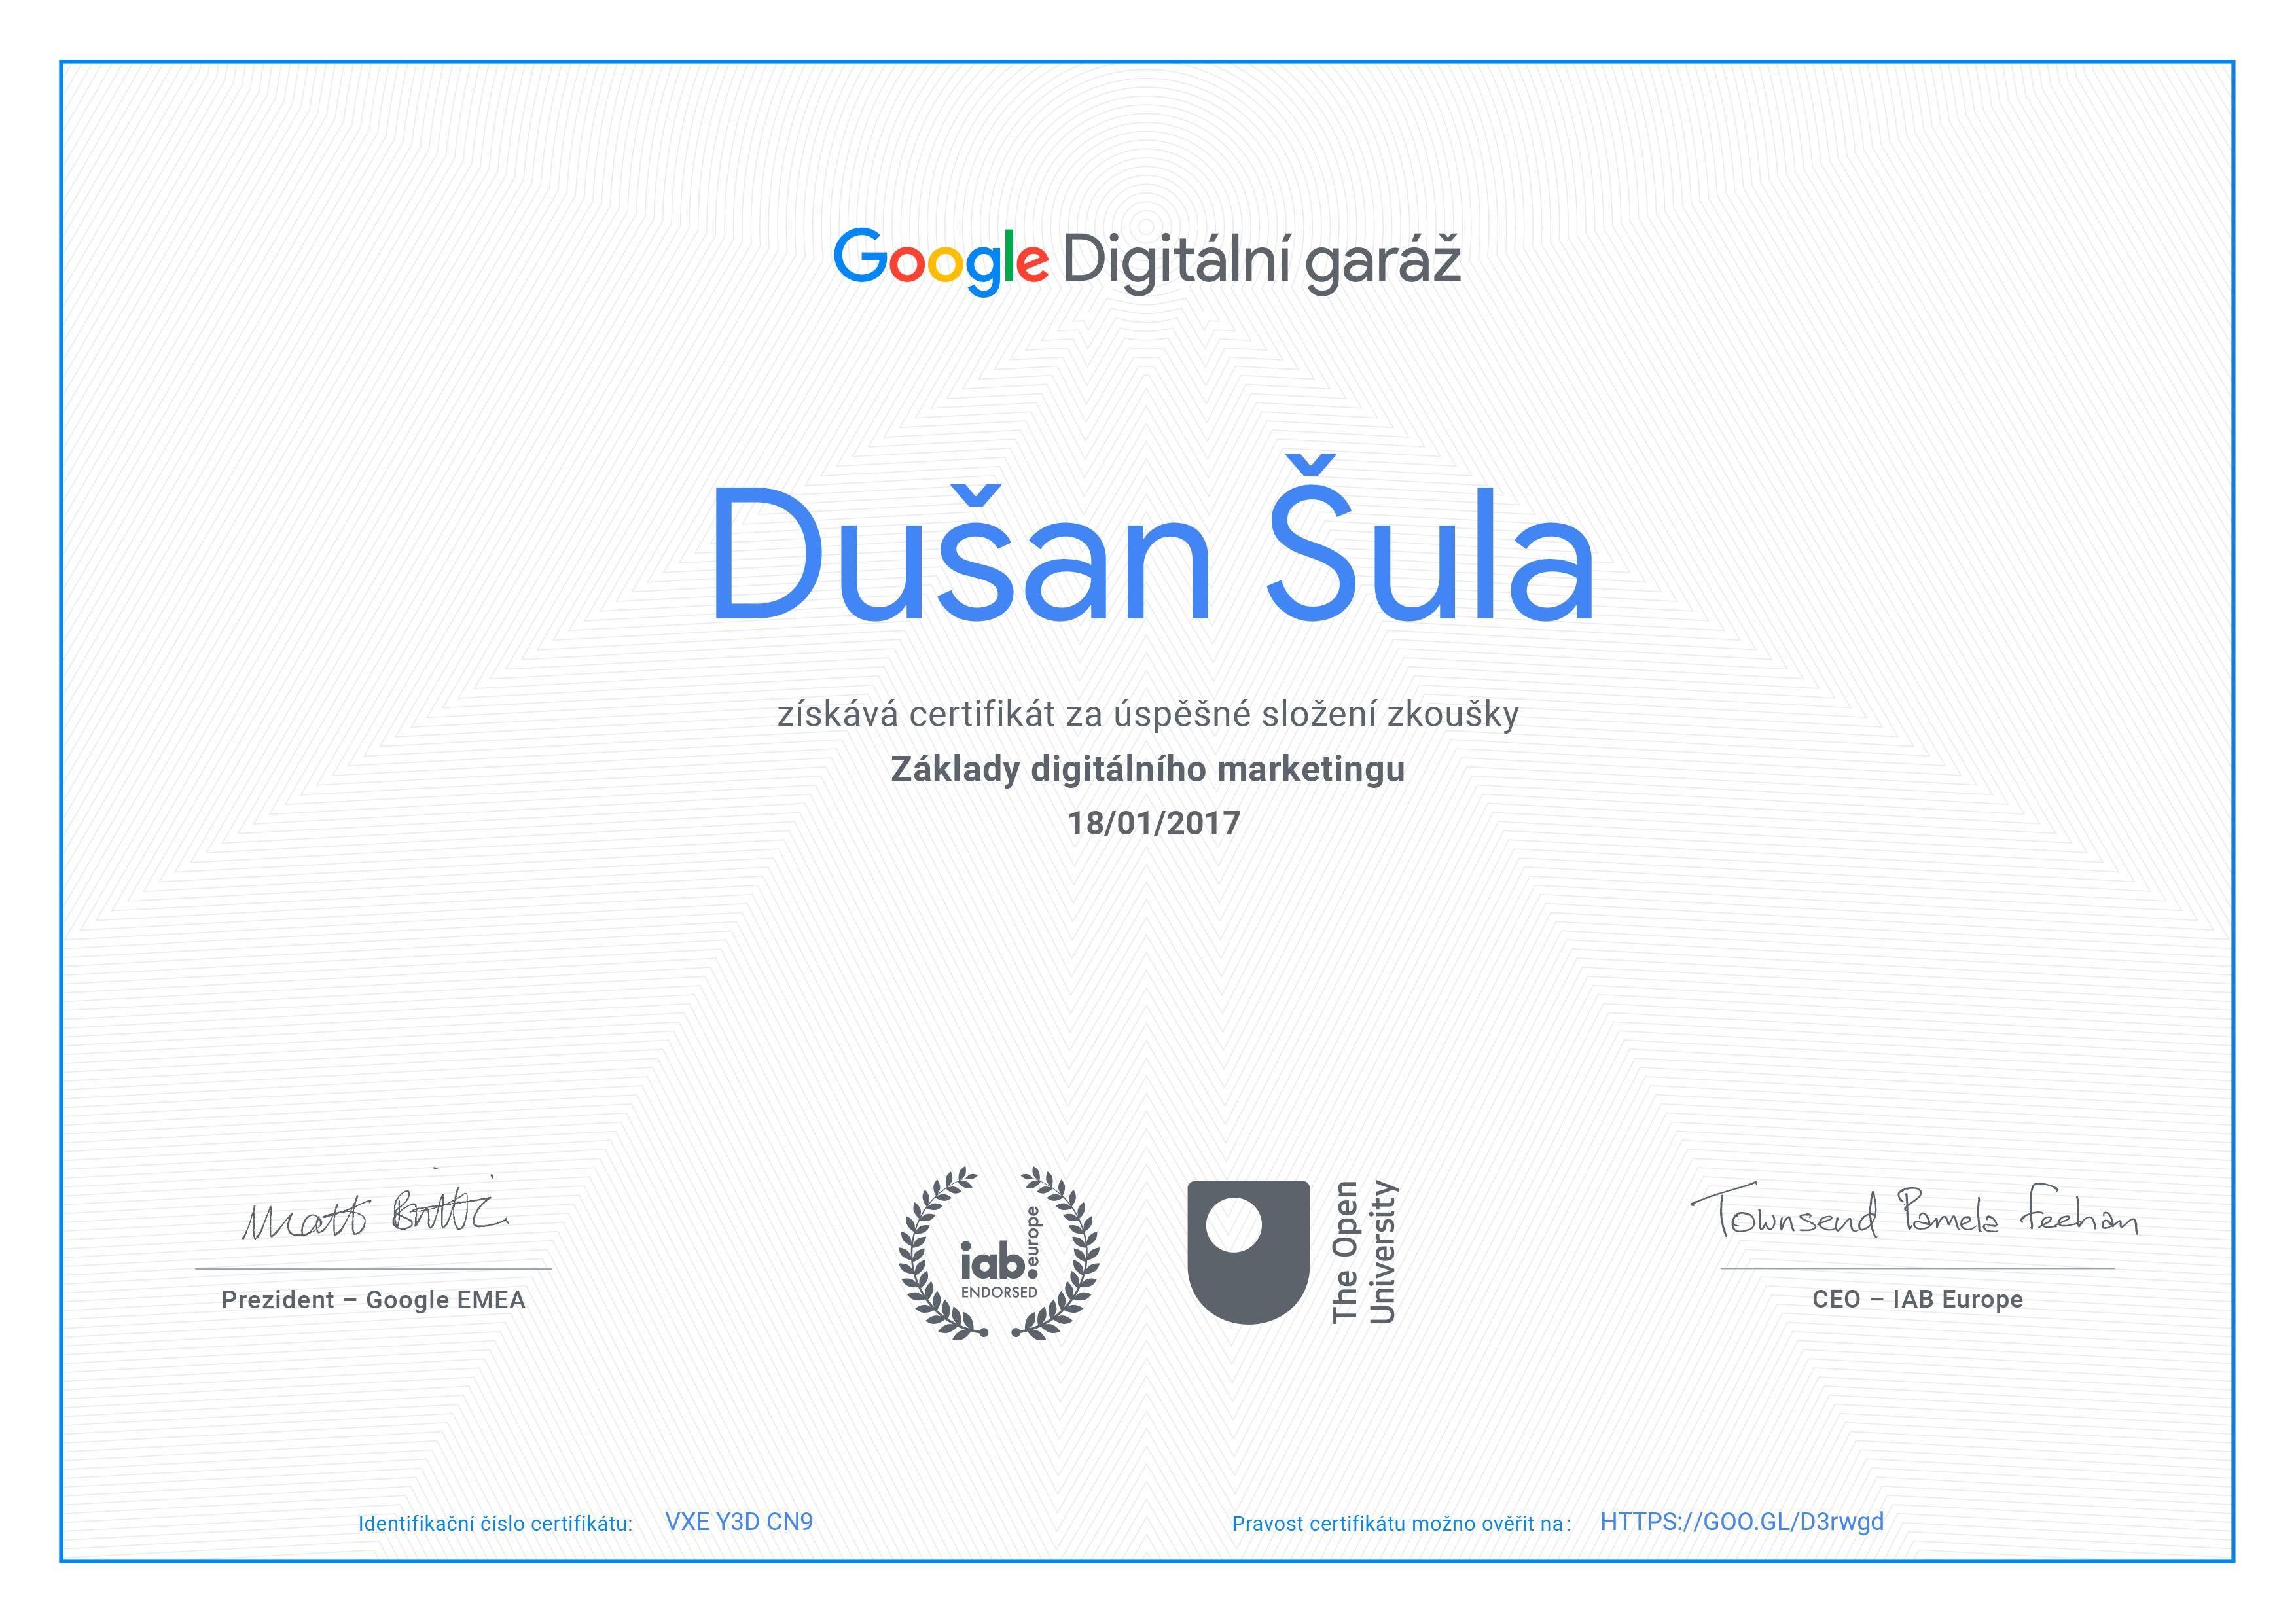 aBoo - Google certifikát